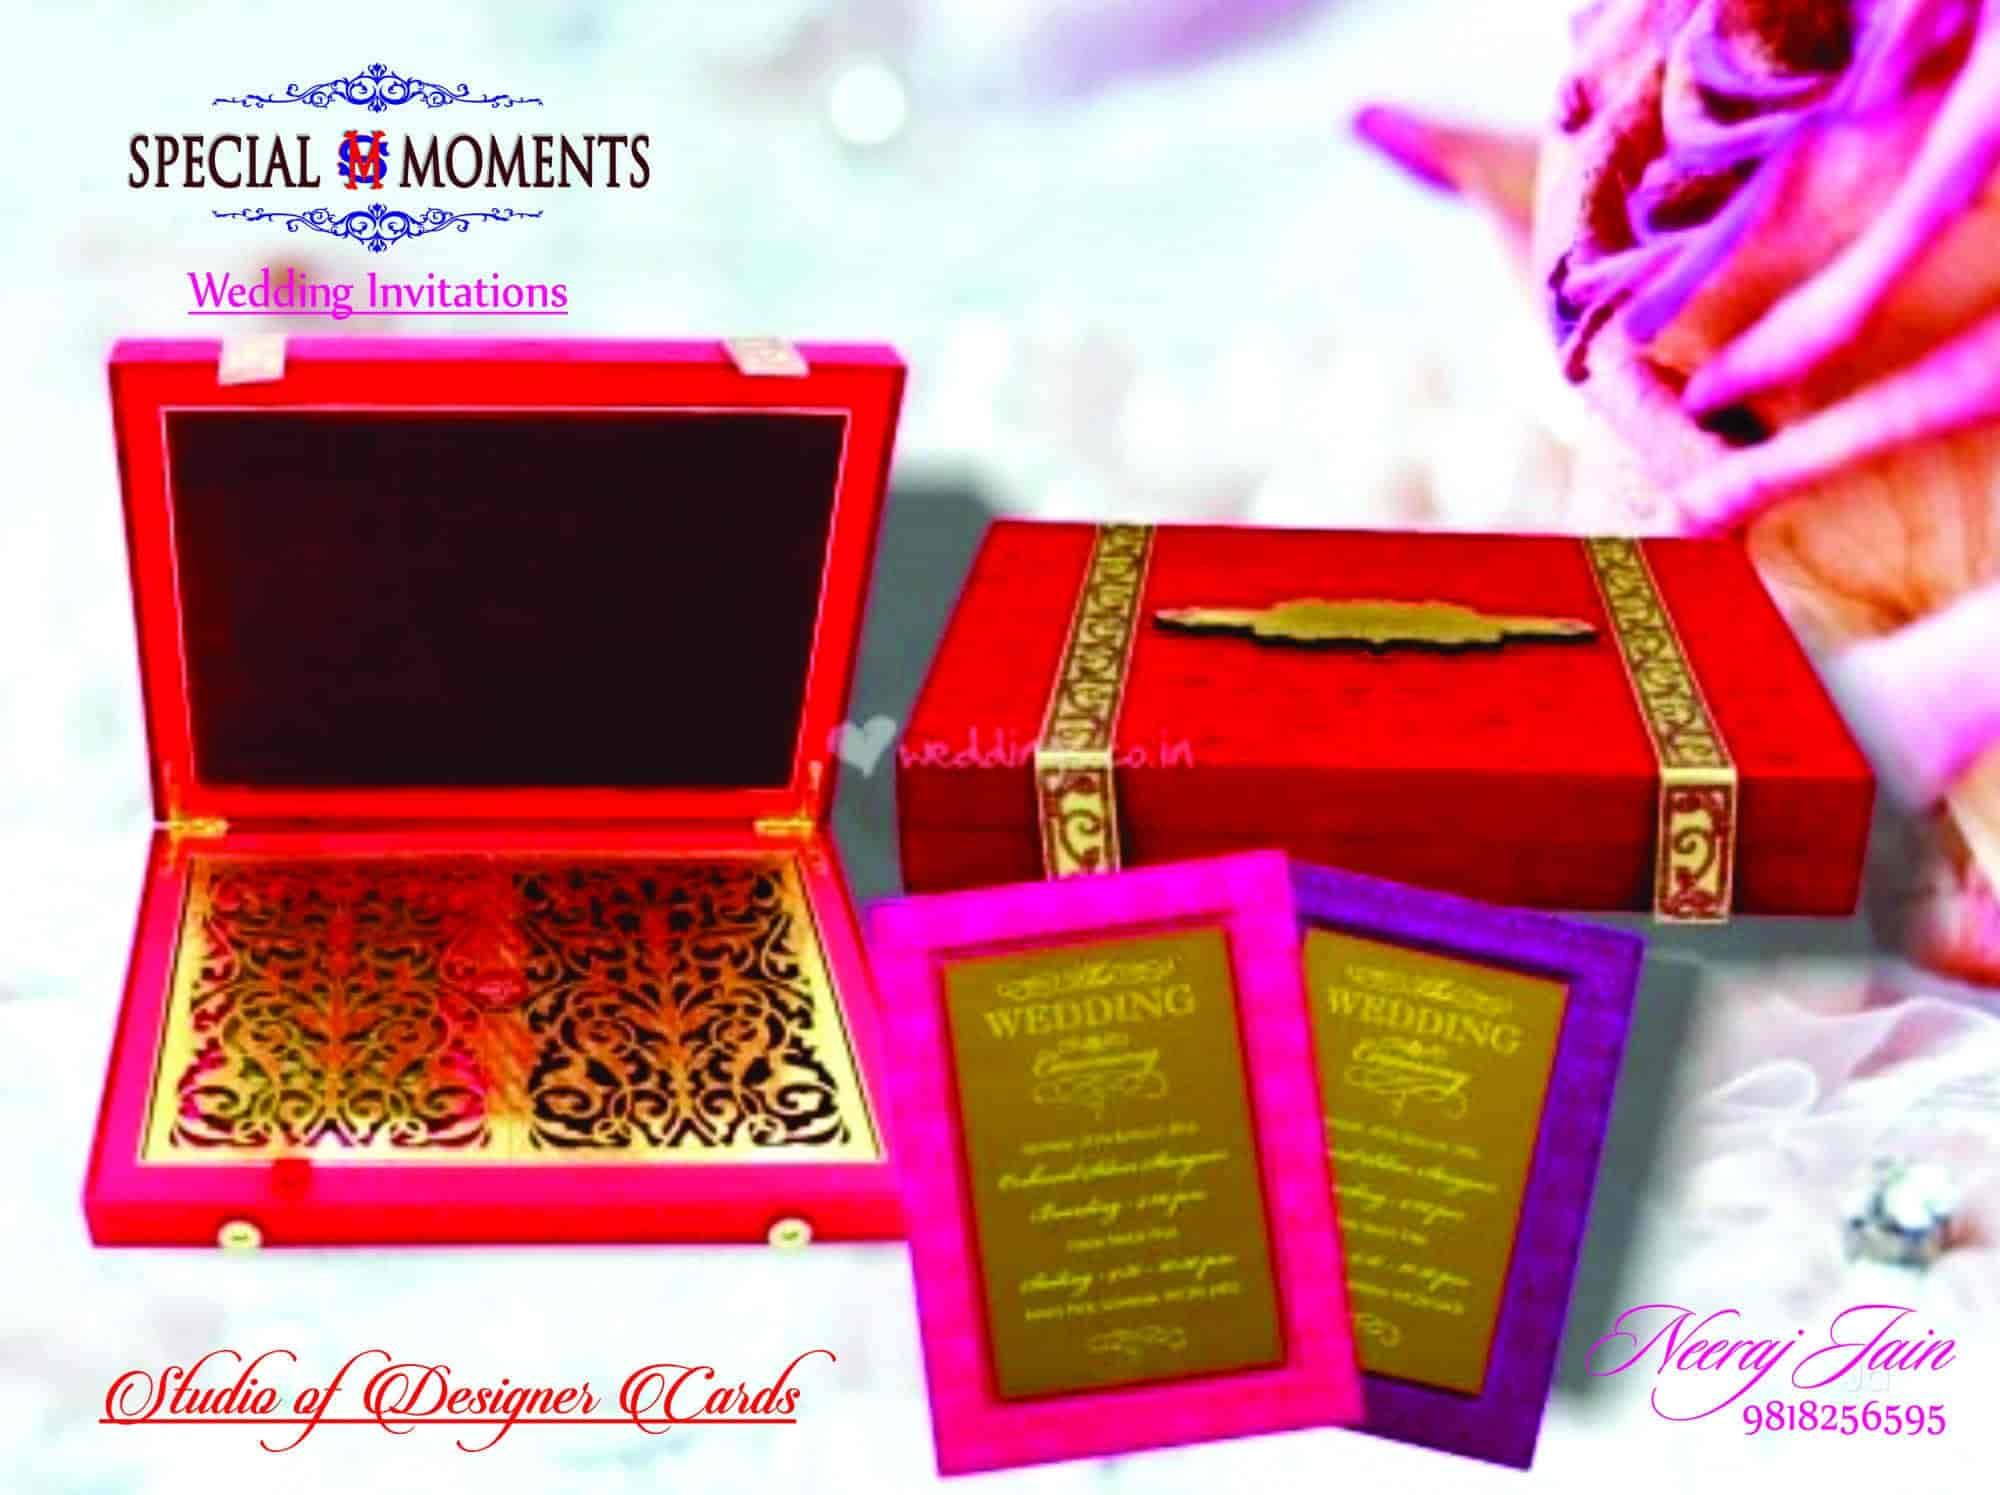 Special Moments Chawri Bazar Wedding Card